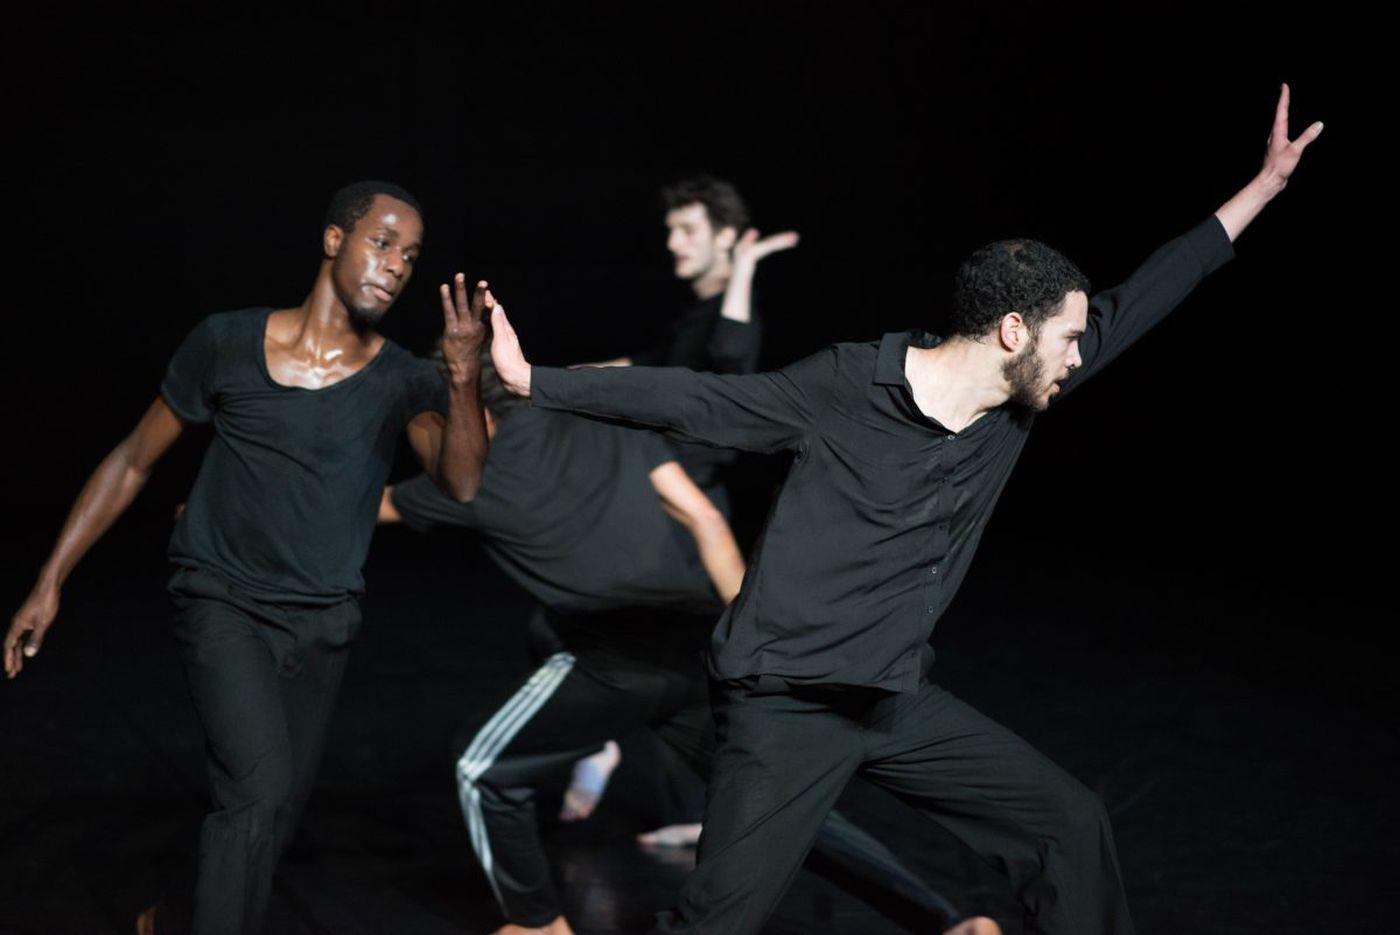 John Coltrane's 'A Love Supreme' gets Fringe Fested, as a dance